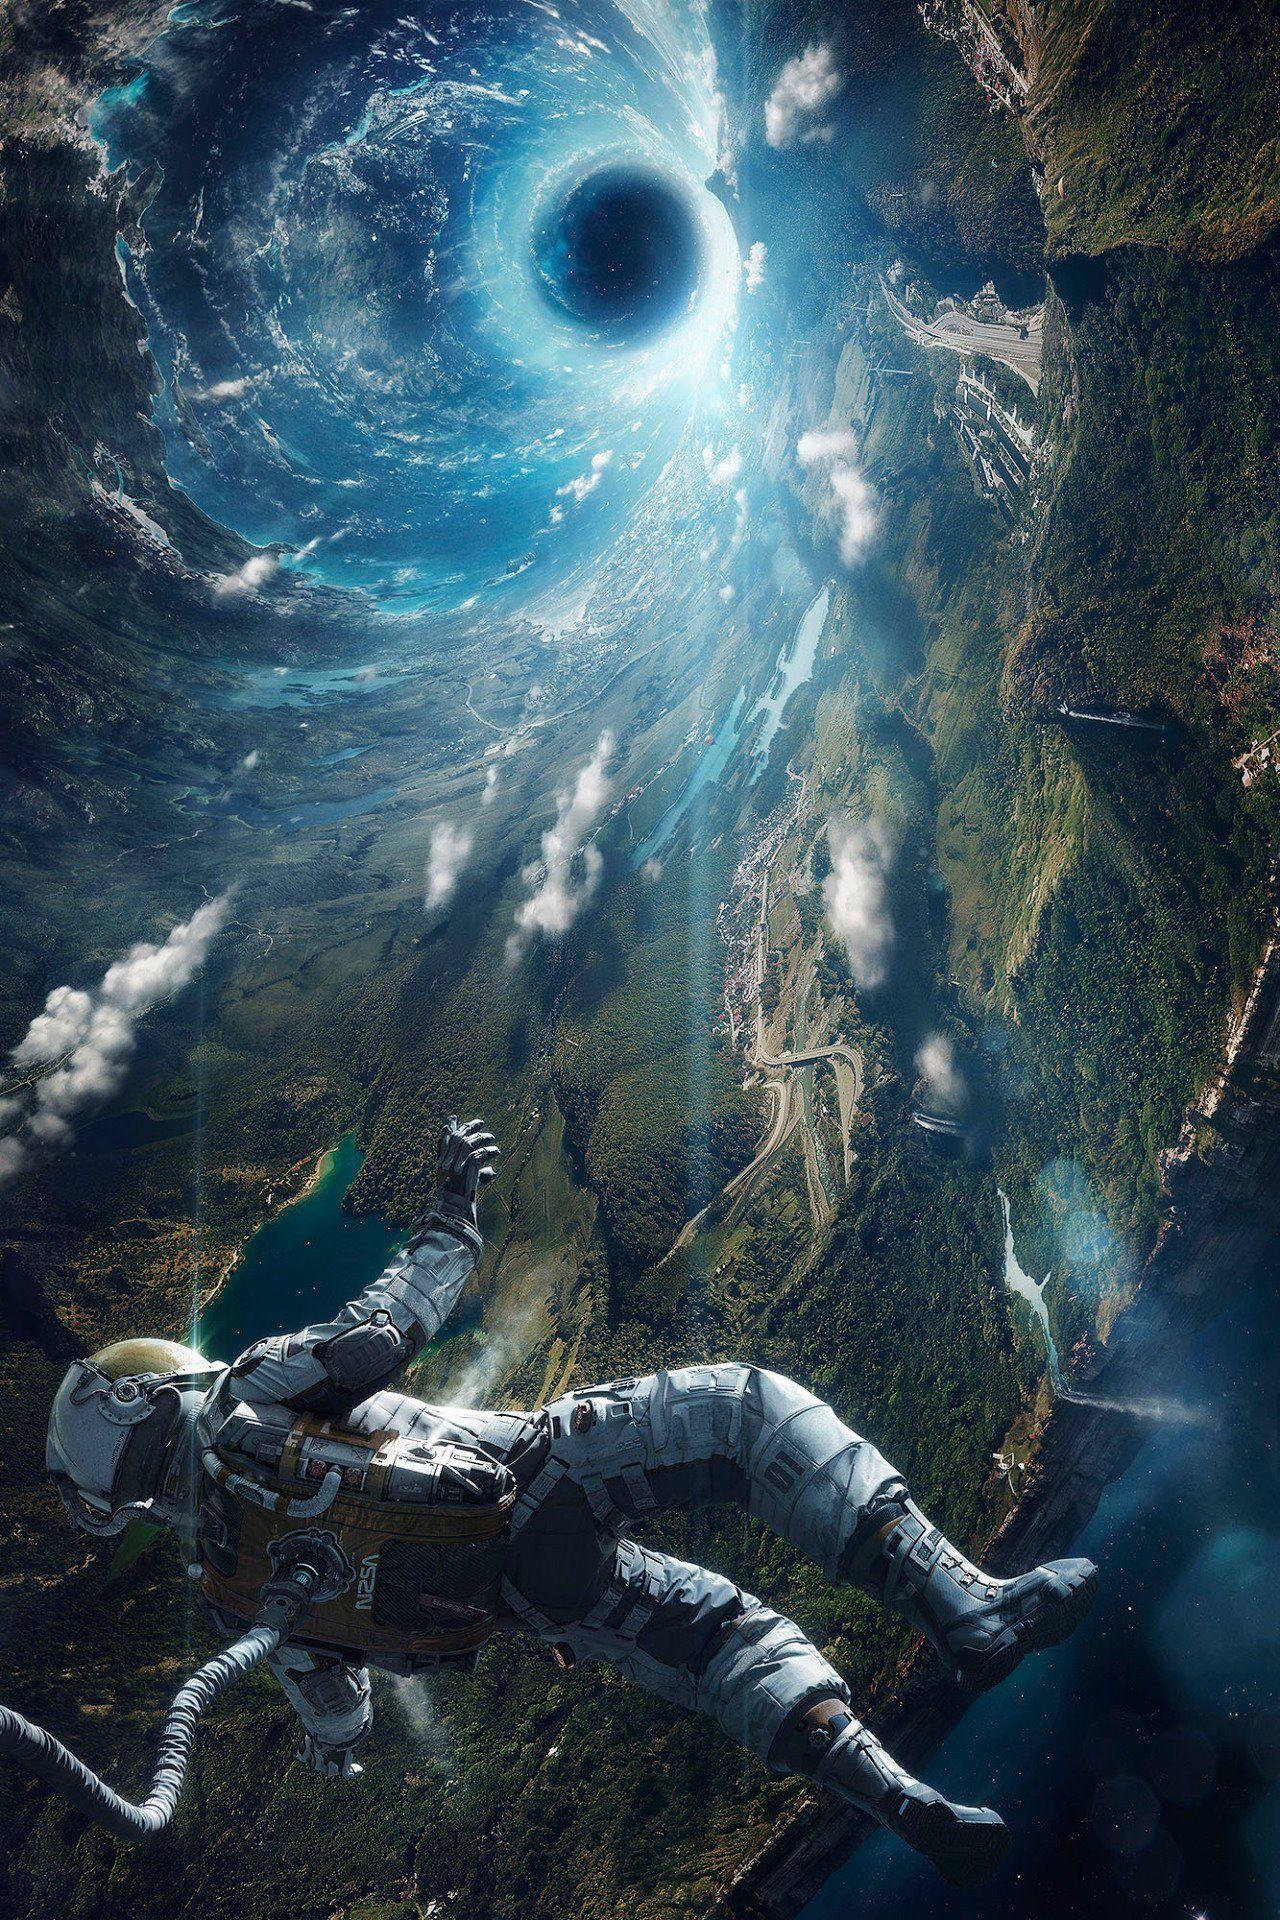 astronaut in space art - photo #12